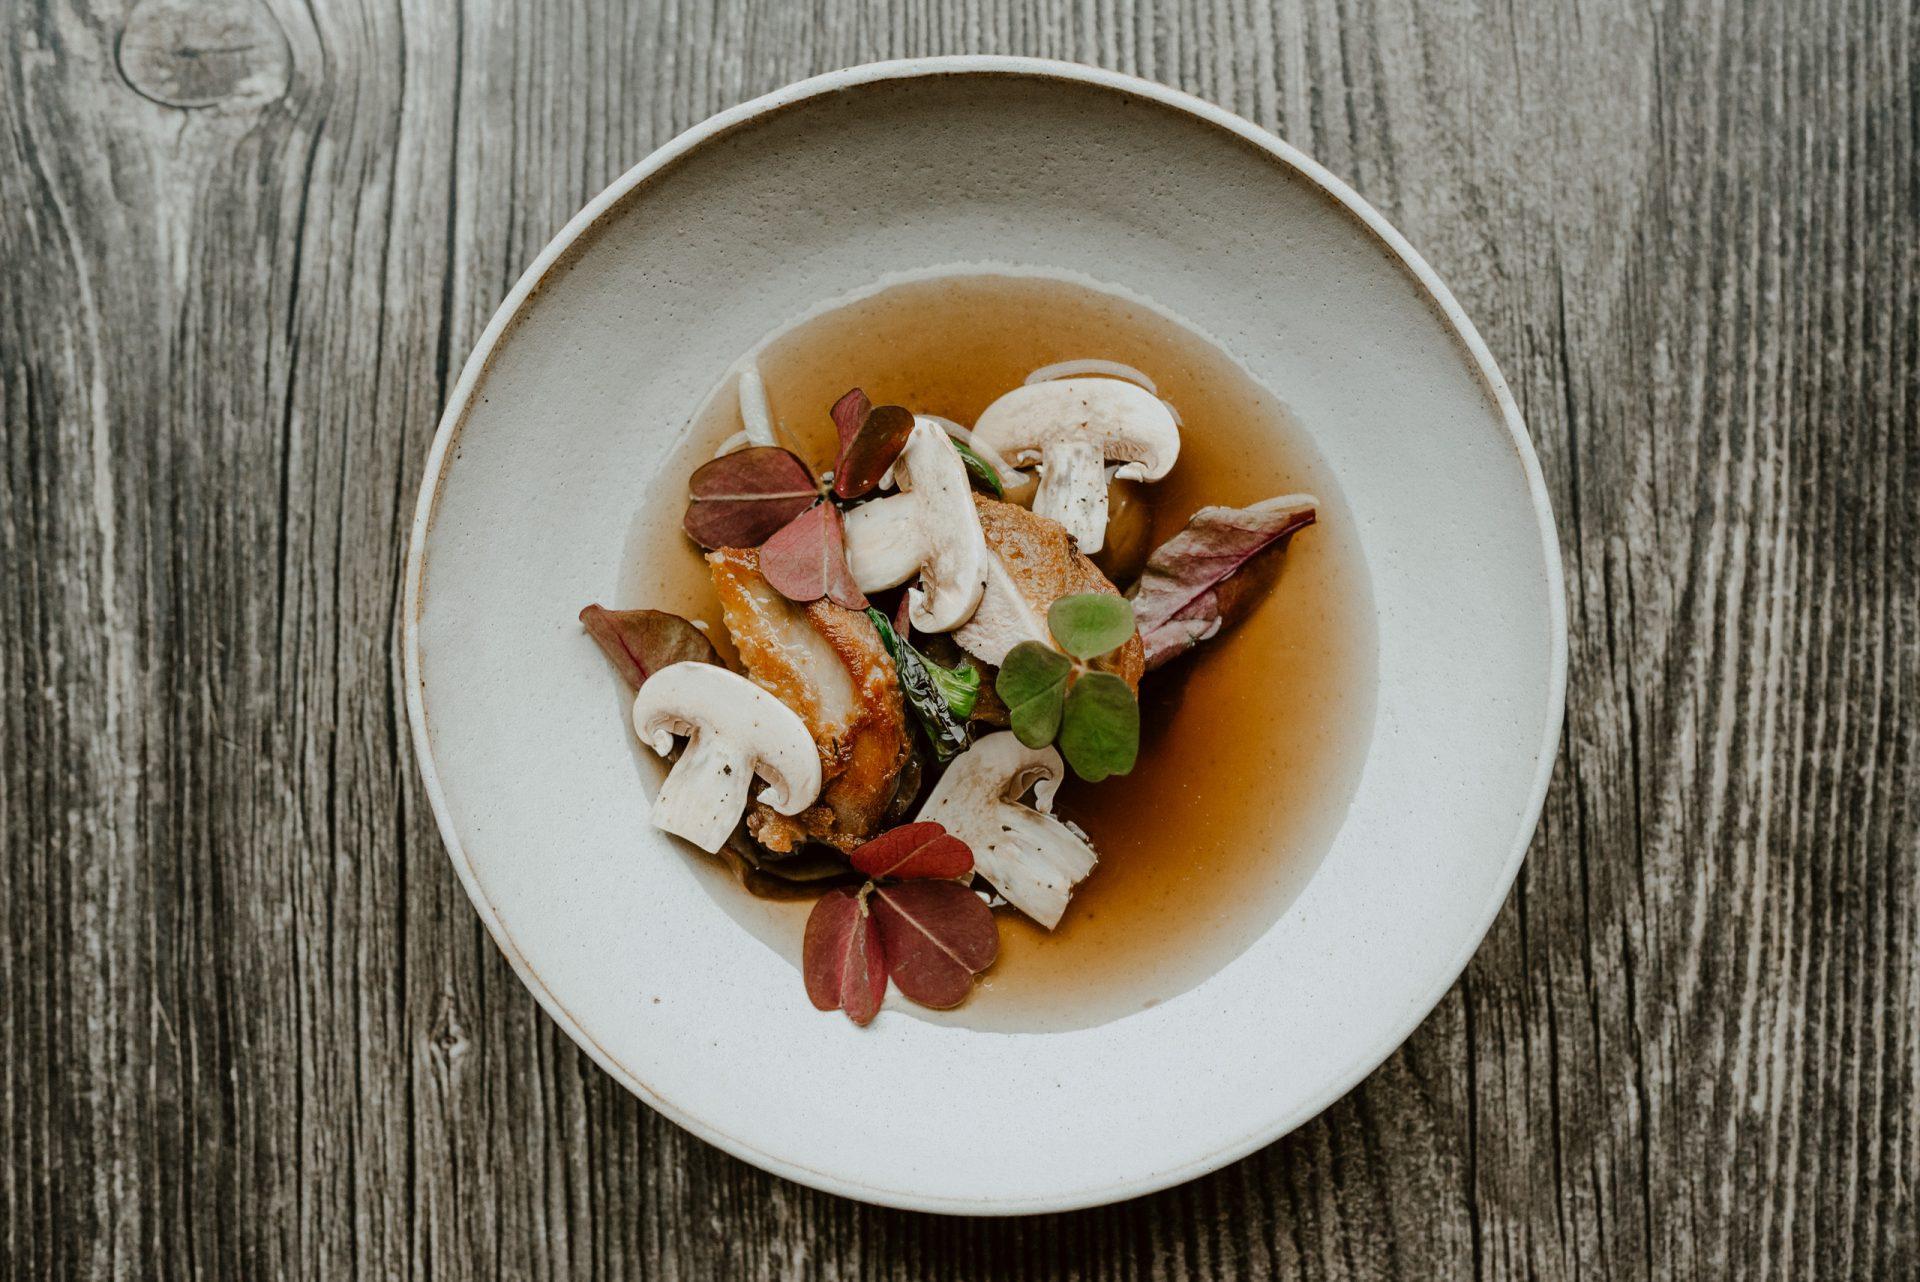 Roberta Hall McCarron's BBQ quail with mushroom broth, onions and leeks. Credit: Amelia Claudia